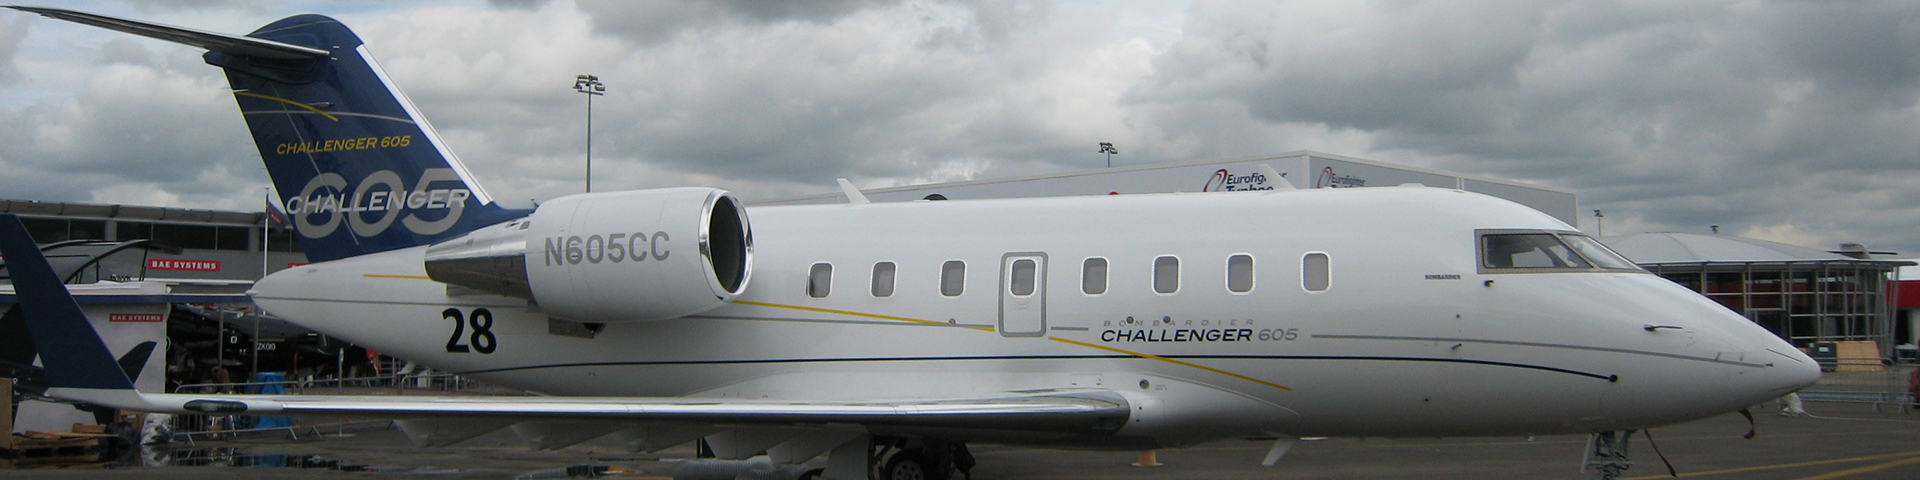 Challenger 6051 - Challenger 604/605 Private Jet